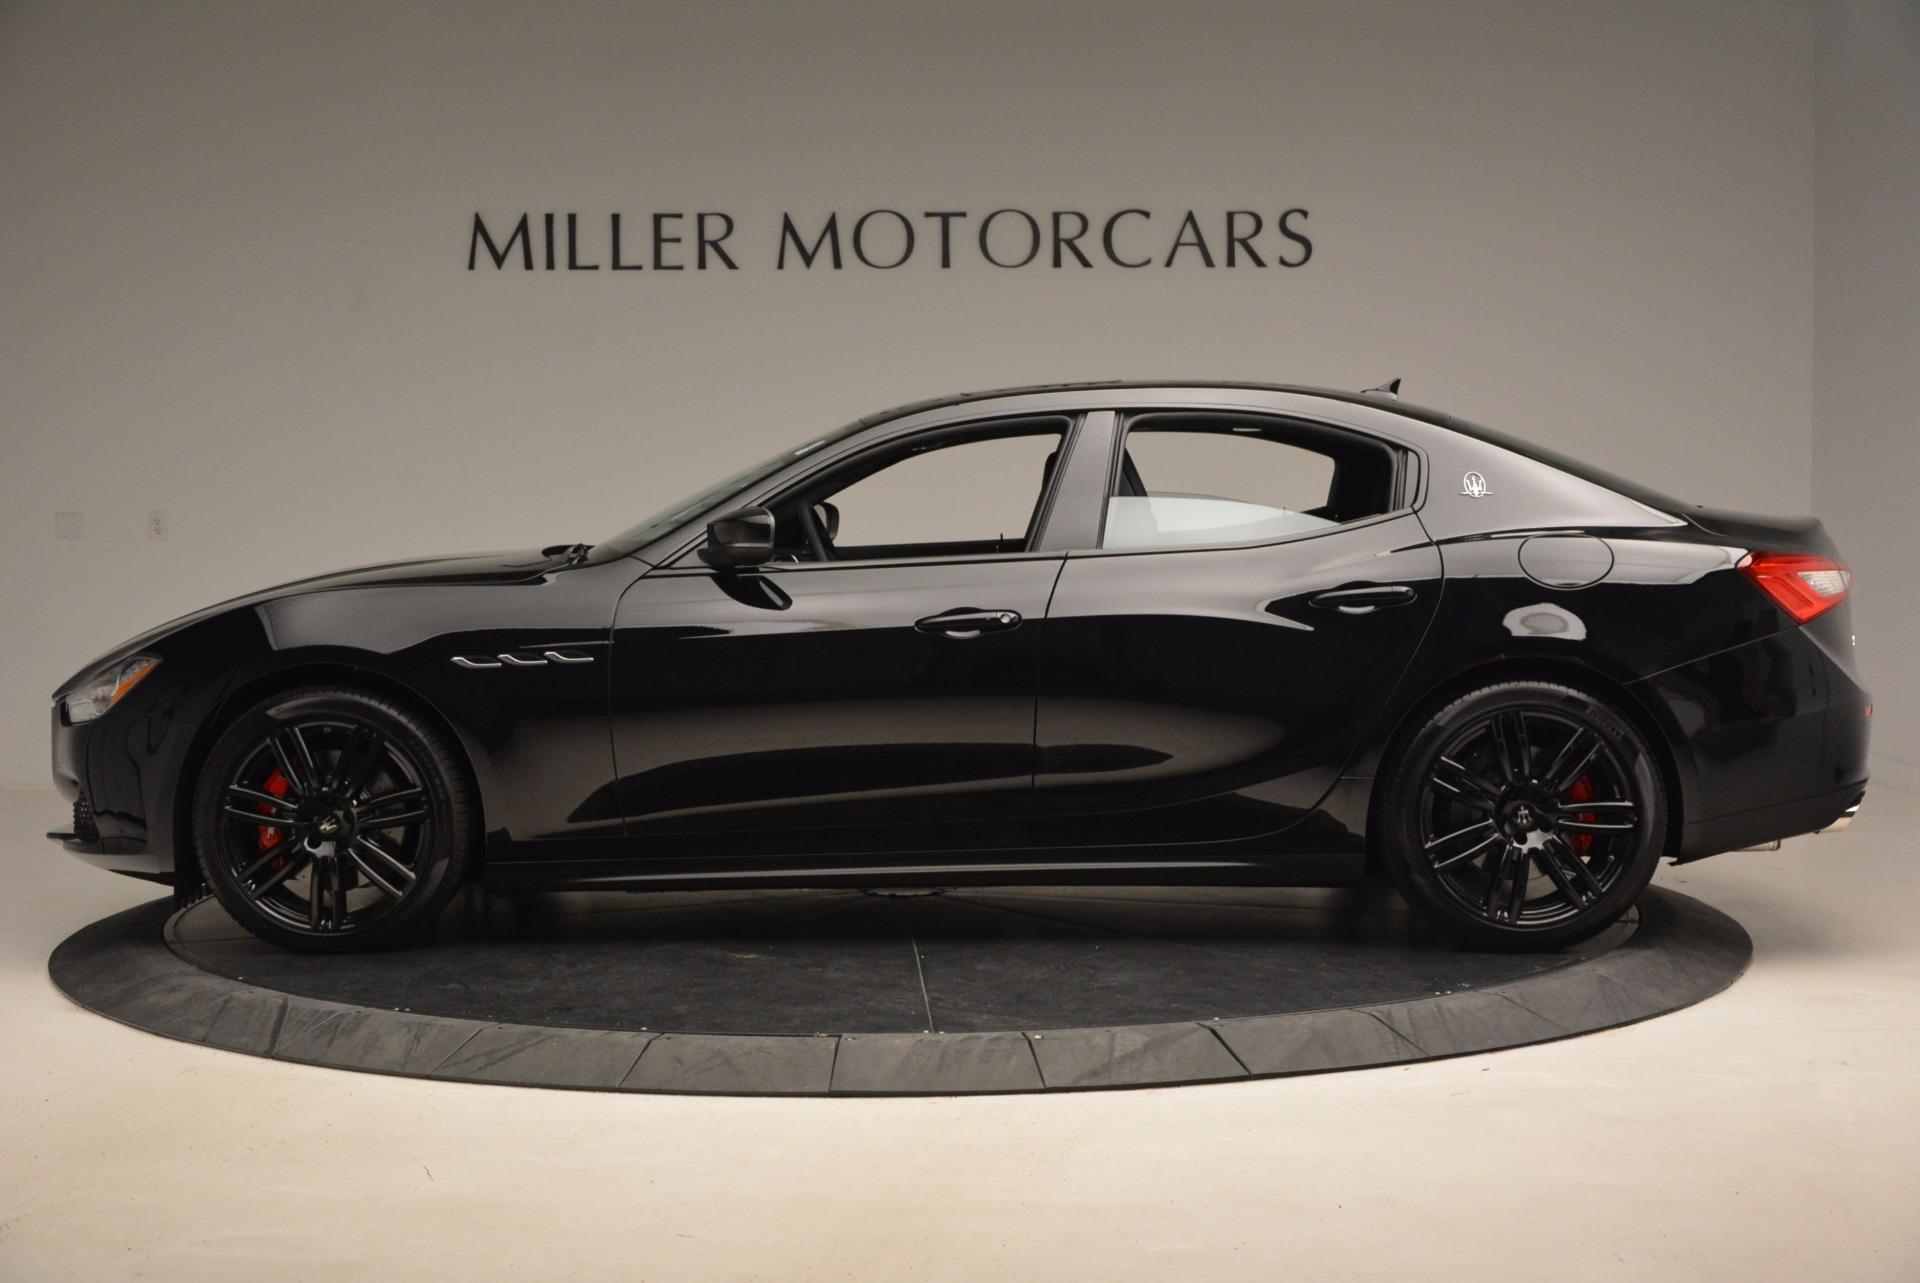 New-2017-Maserati-Ghibli-SQ4-S-Q4-Nerissimo-Edition